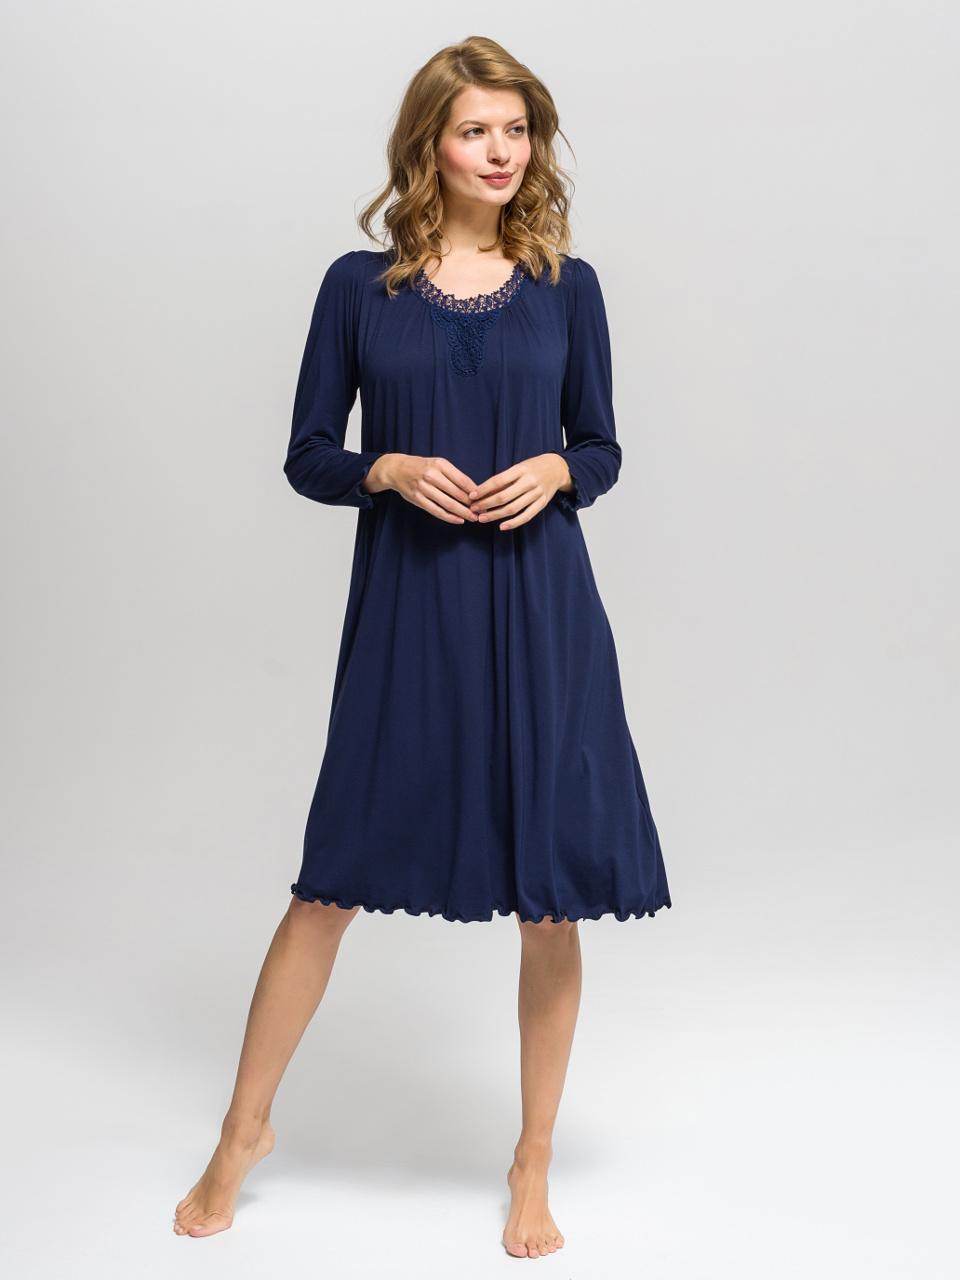 B37 Camicia da notte<br />03 Navy Blue, 63 Hyacinth